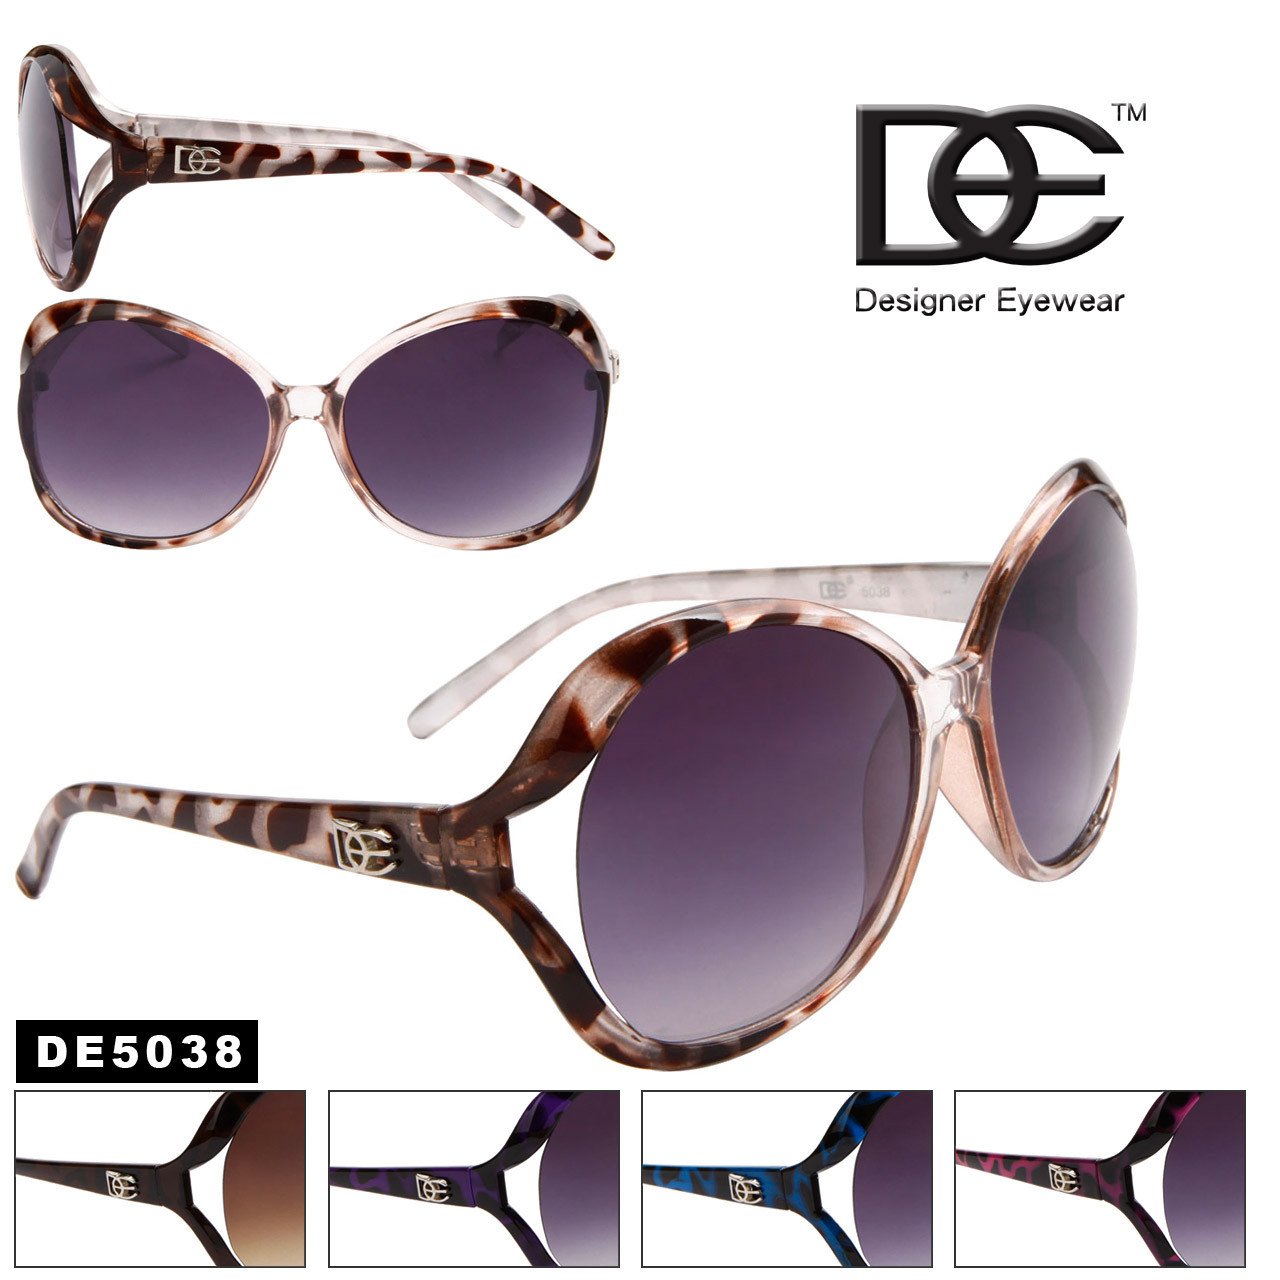 Animal Print Fashion Sunglasses DE5038